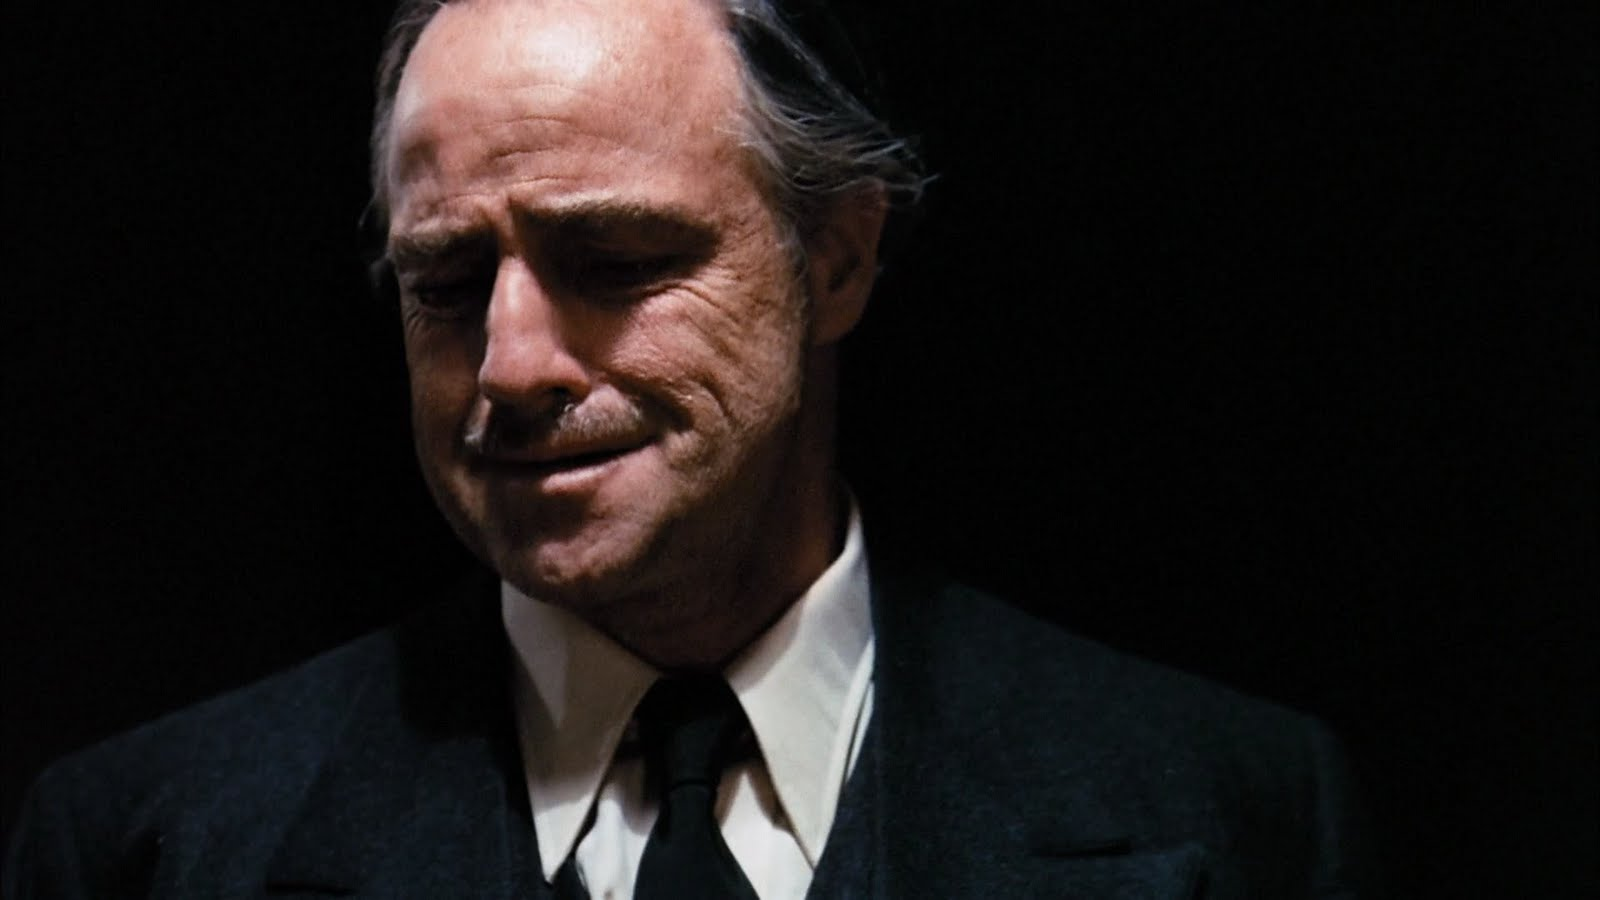 Marlon Brando Vito Corleone Sonny Corleone Gentleman - They Ve Massacred My Boy - HD Wallpaper